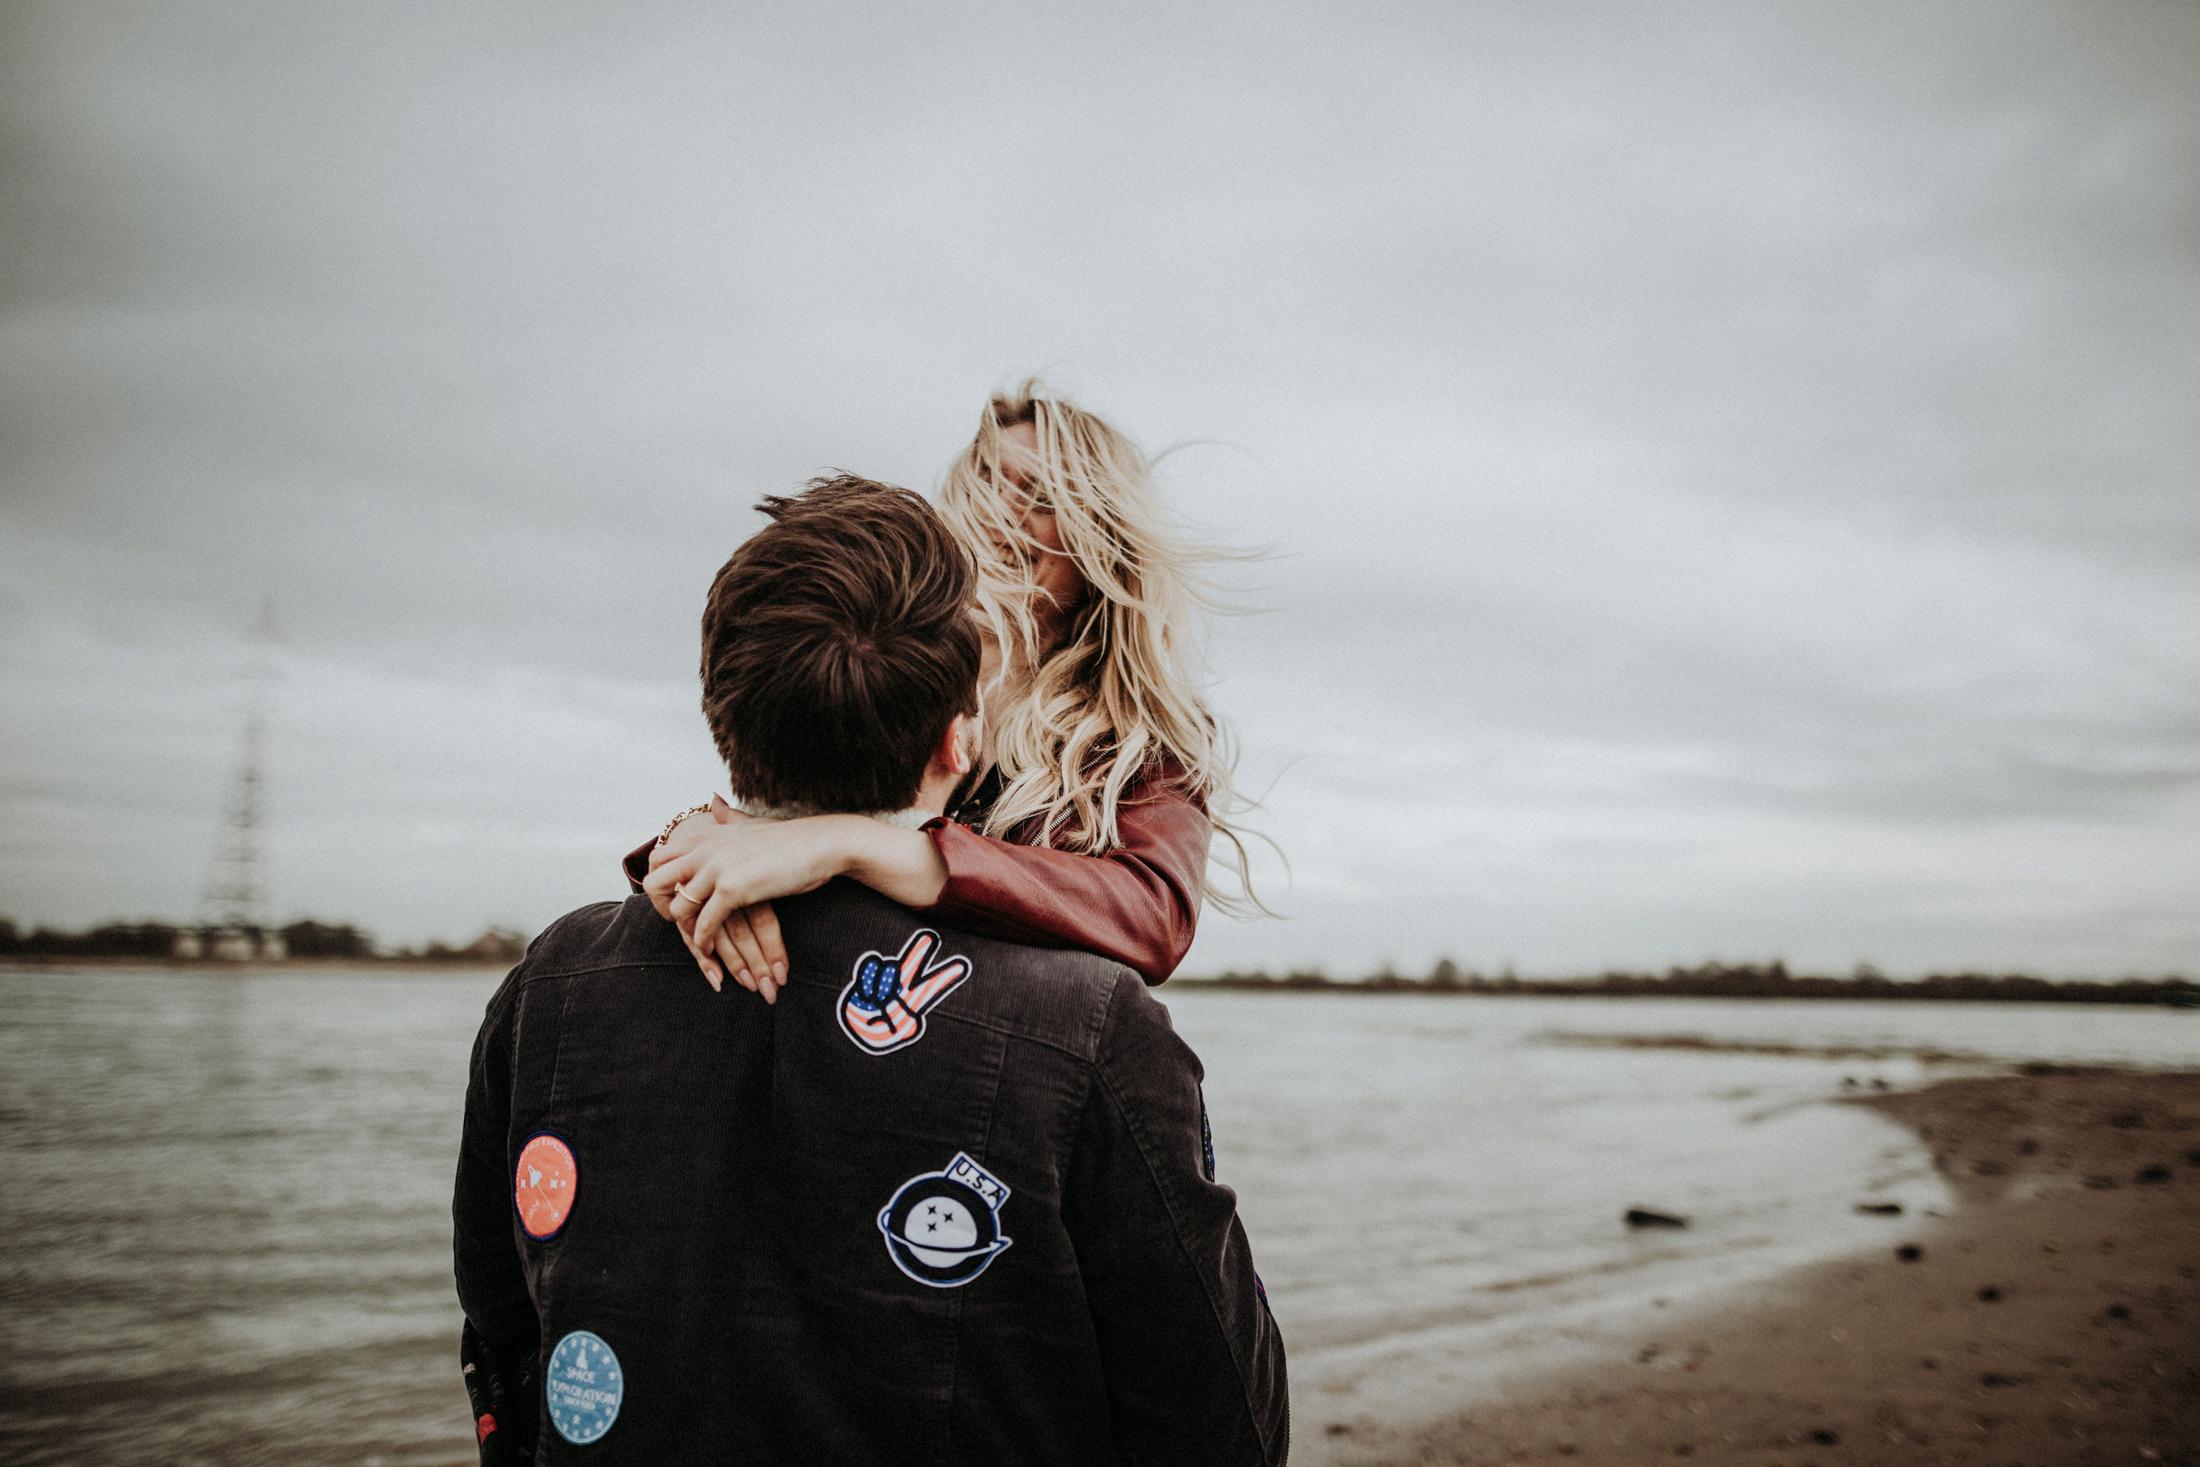 Wedding_Photographer_Mallorca_DanielaMarquardt_Photography_CanaryIslands_Lanzarote_Iceland_Tuscany_Santorini_Portugal_NewYork_Spain_Elopement_Hochzeitsfotograf_CK42